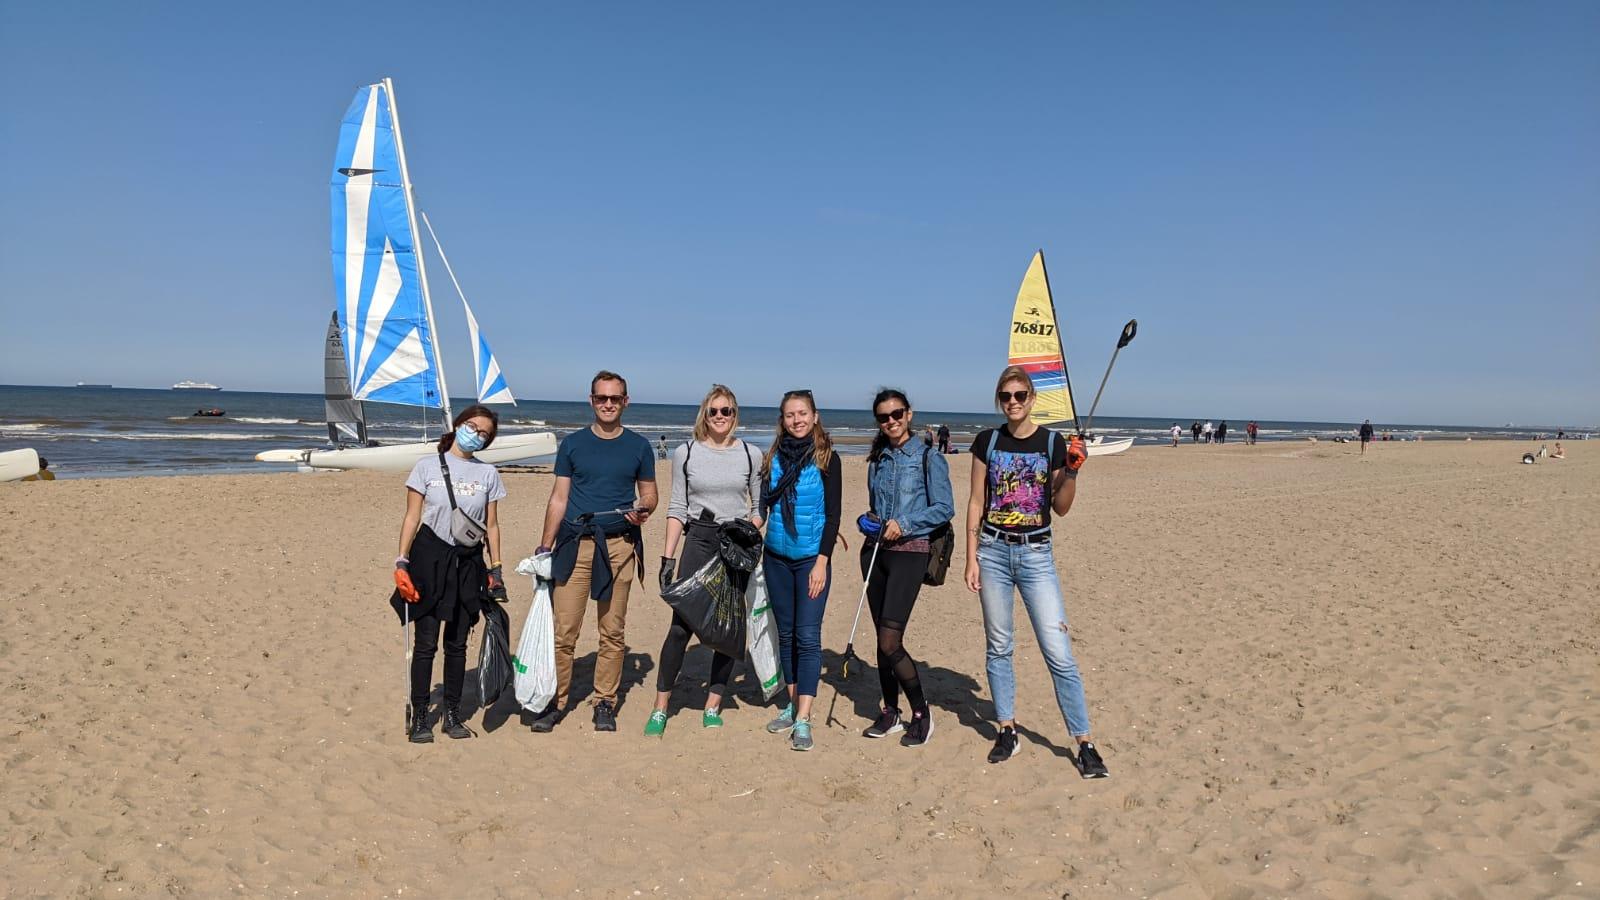 Wereld opruimdag – Beach Clean Up Scheveningen